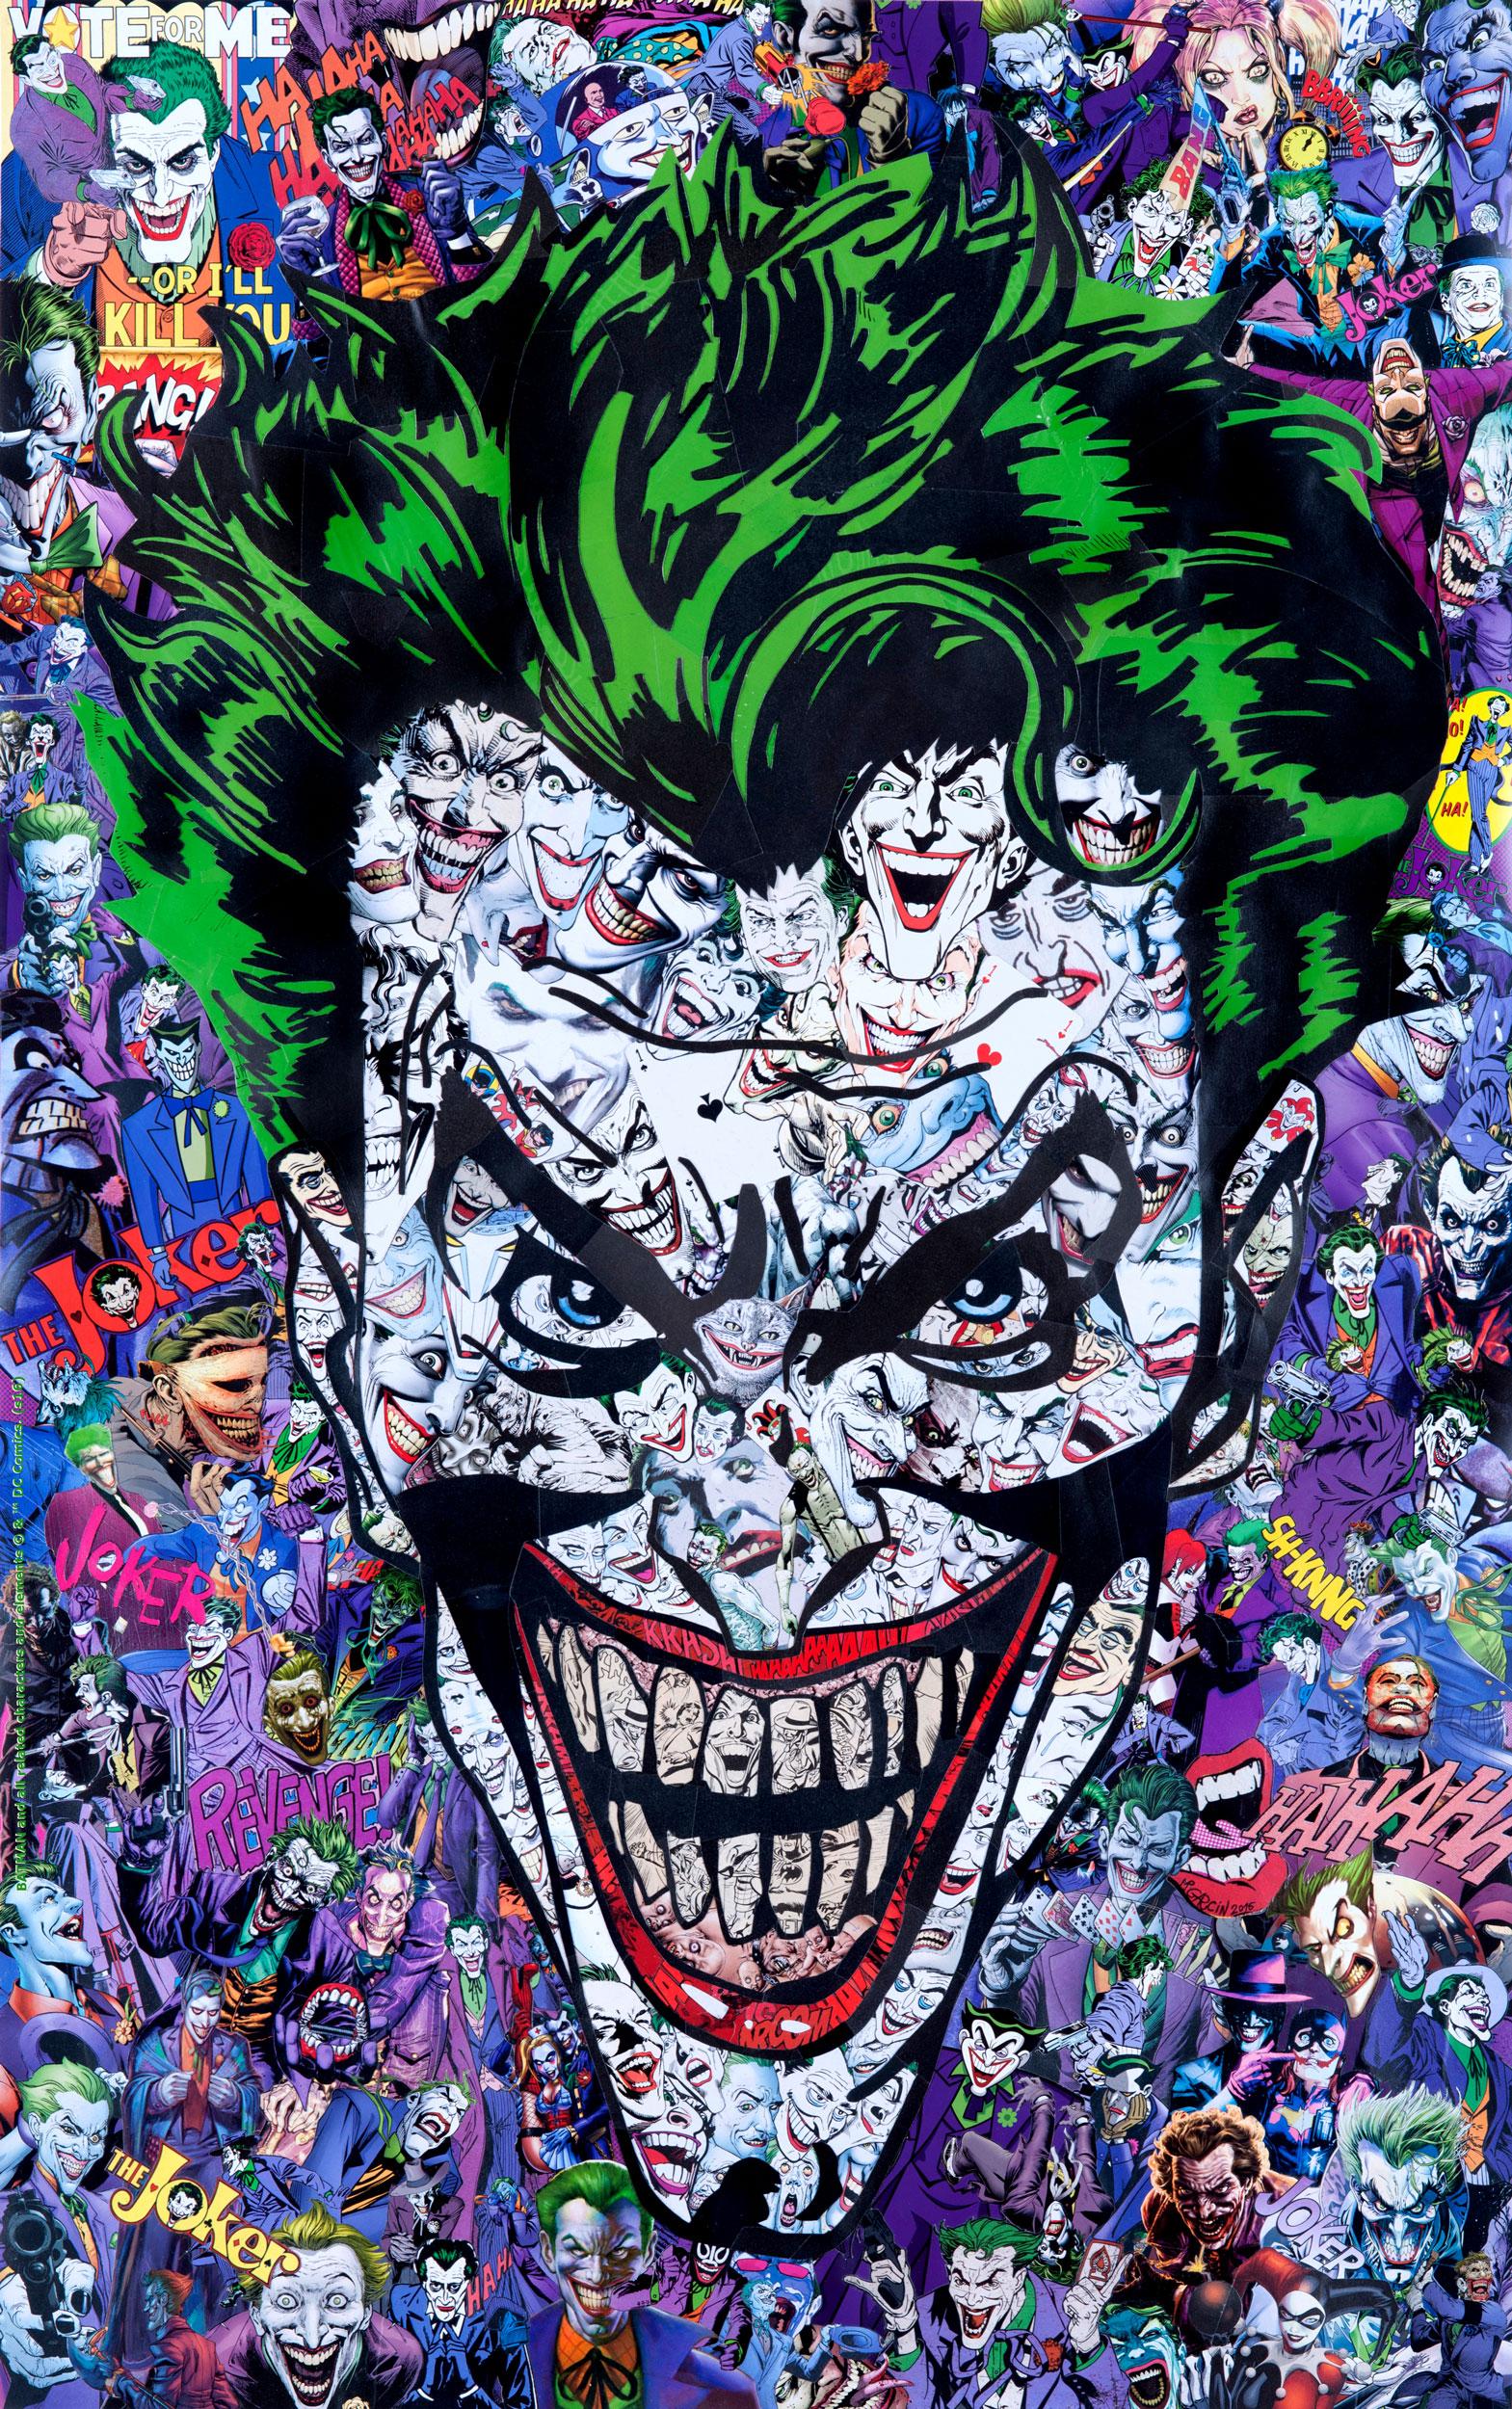 Wallpaper : comic books, Joker 1569x2500 - epicless ...